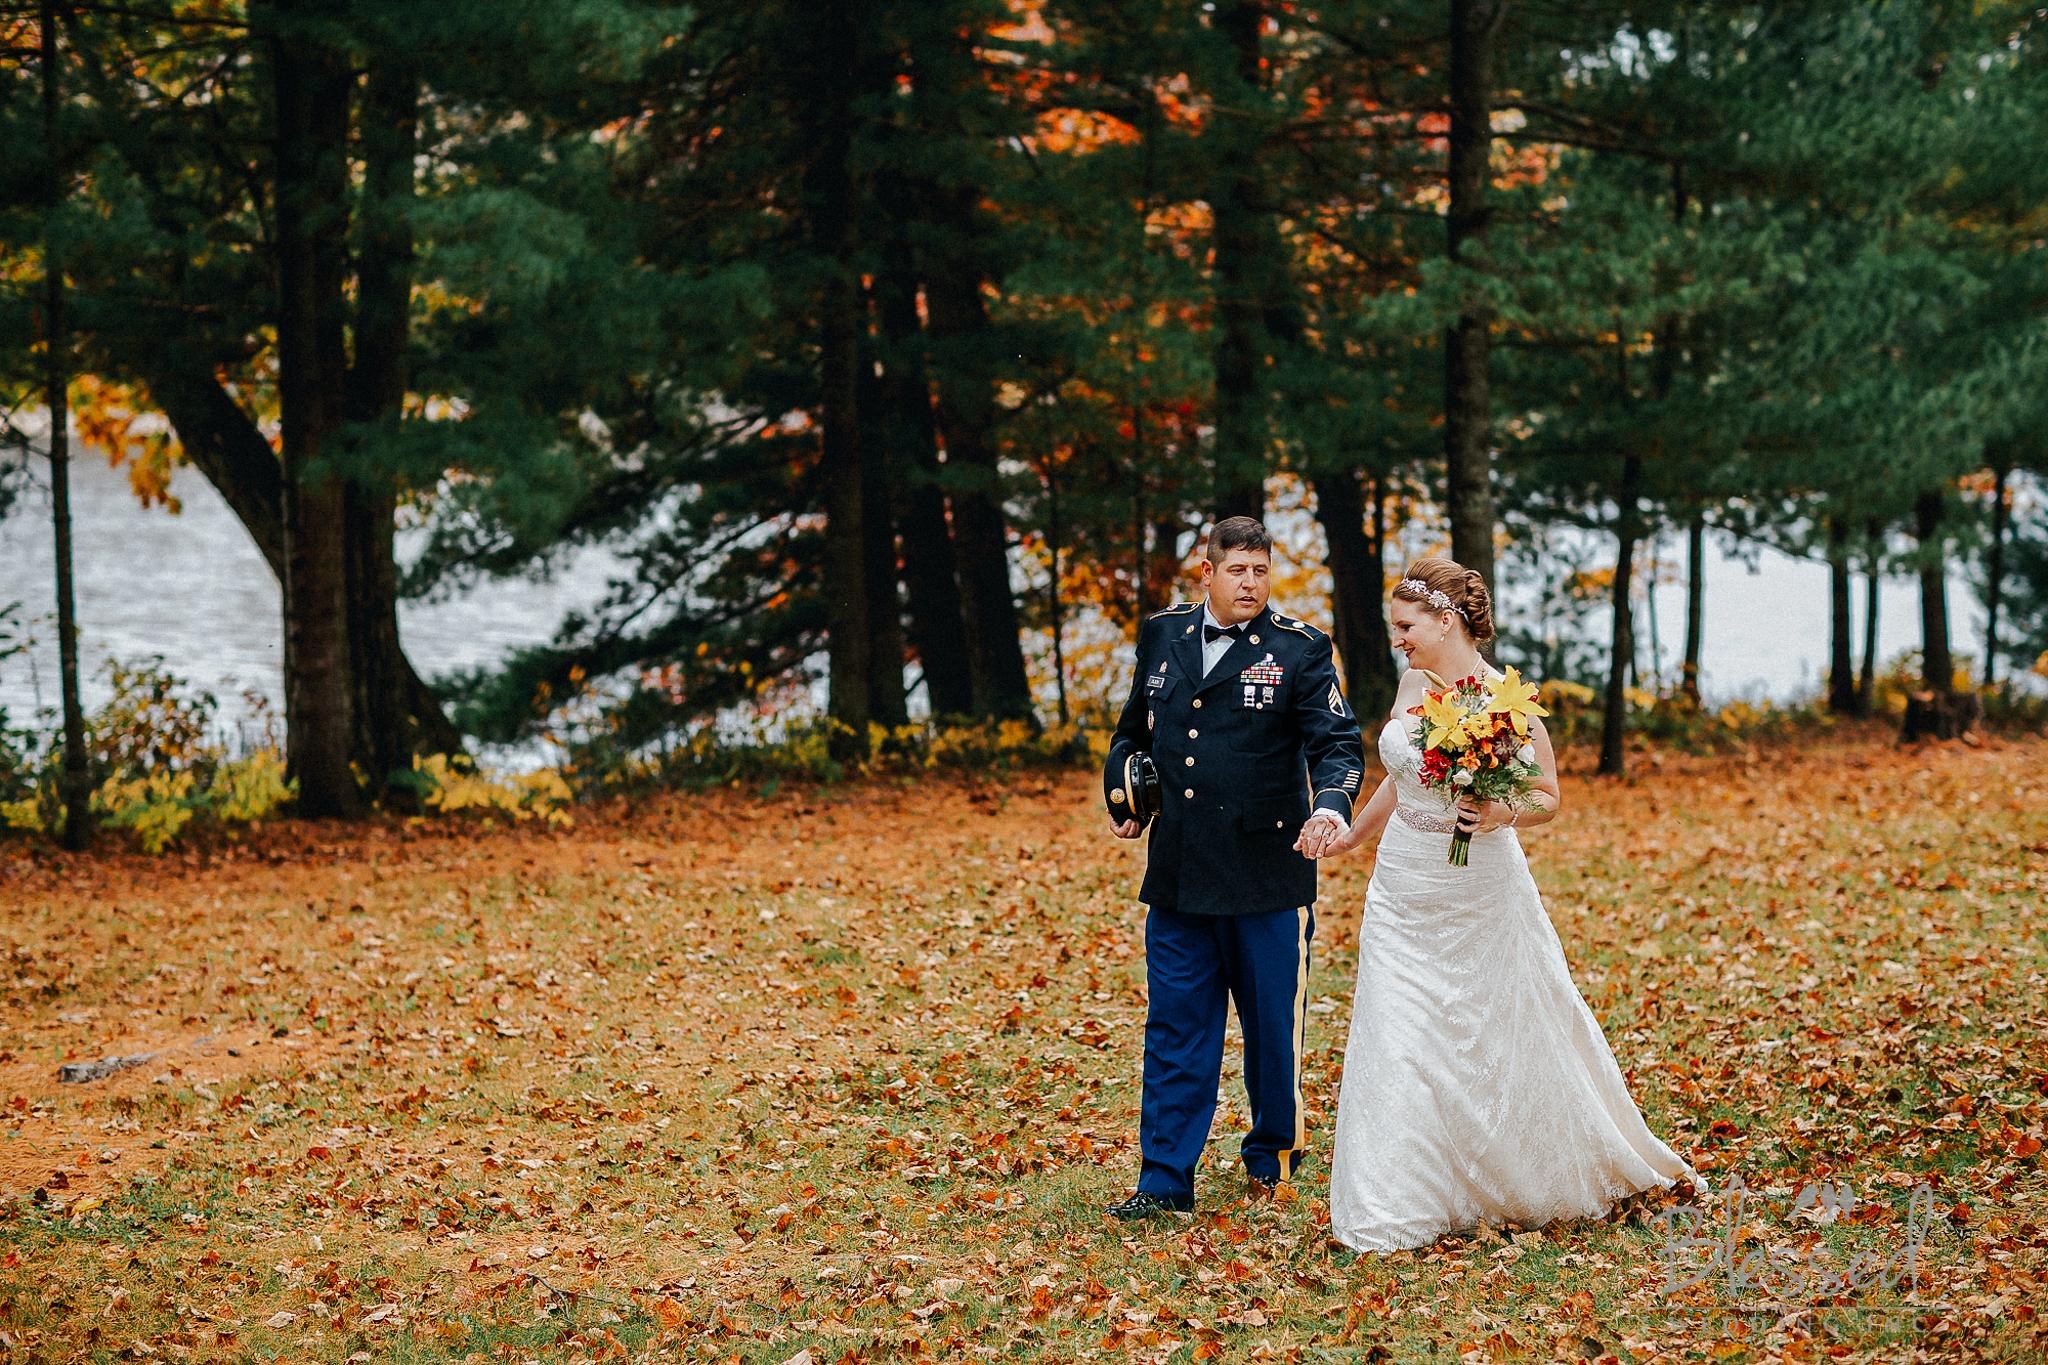 Destination Wedding Photography Minnesota By Blessed Wedding Photographers-23.jpg